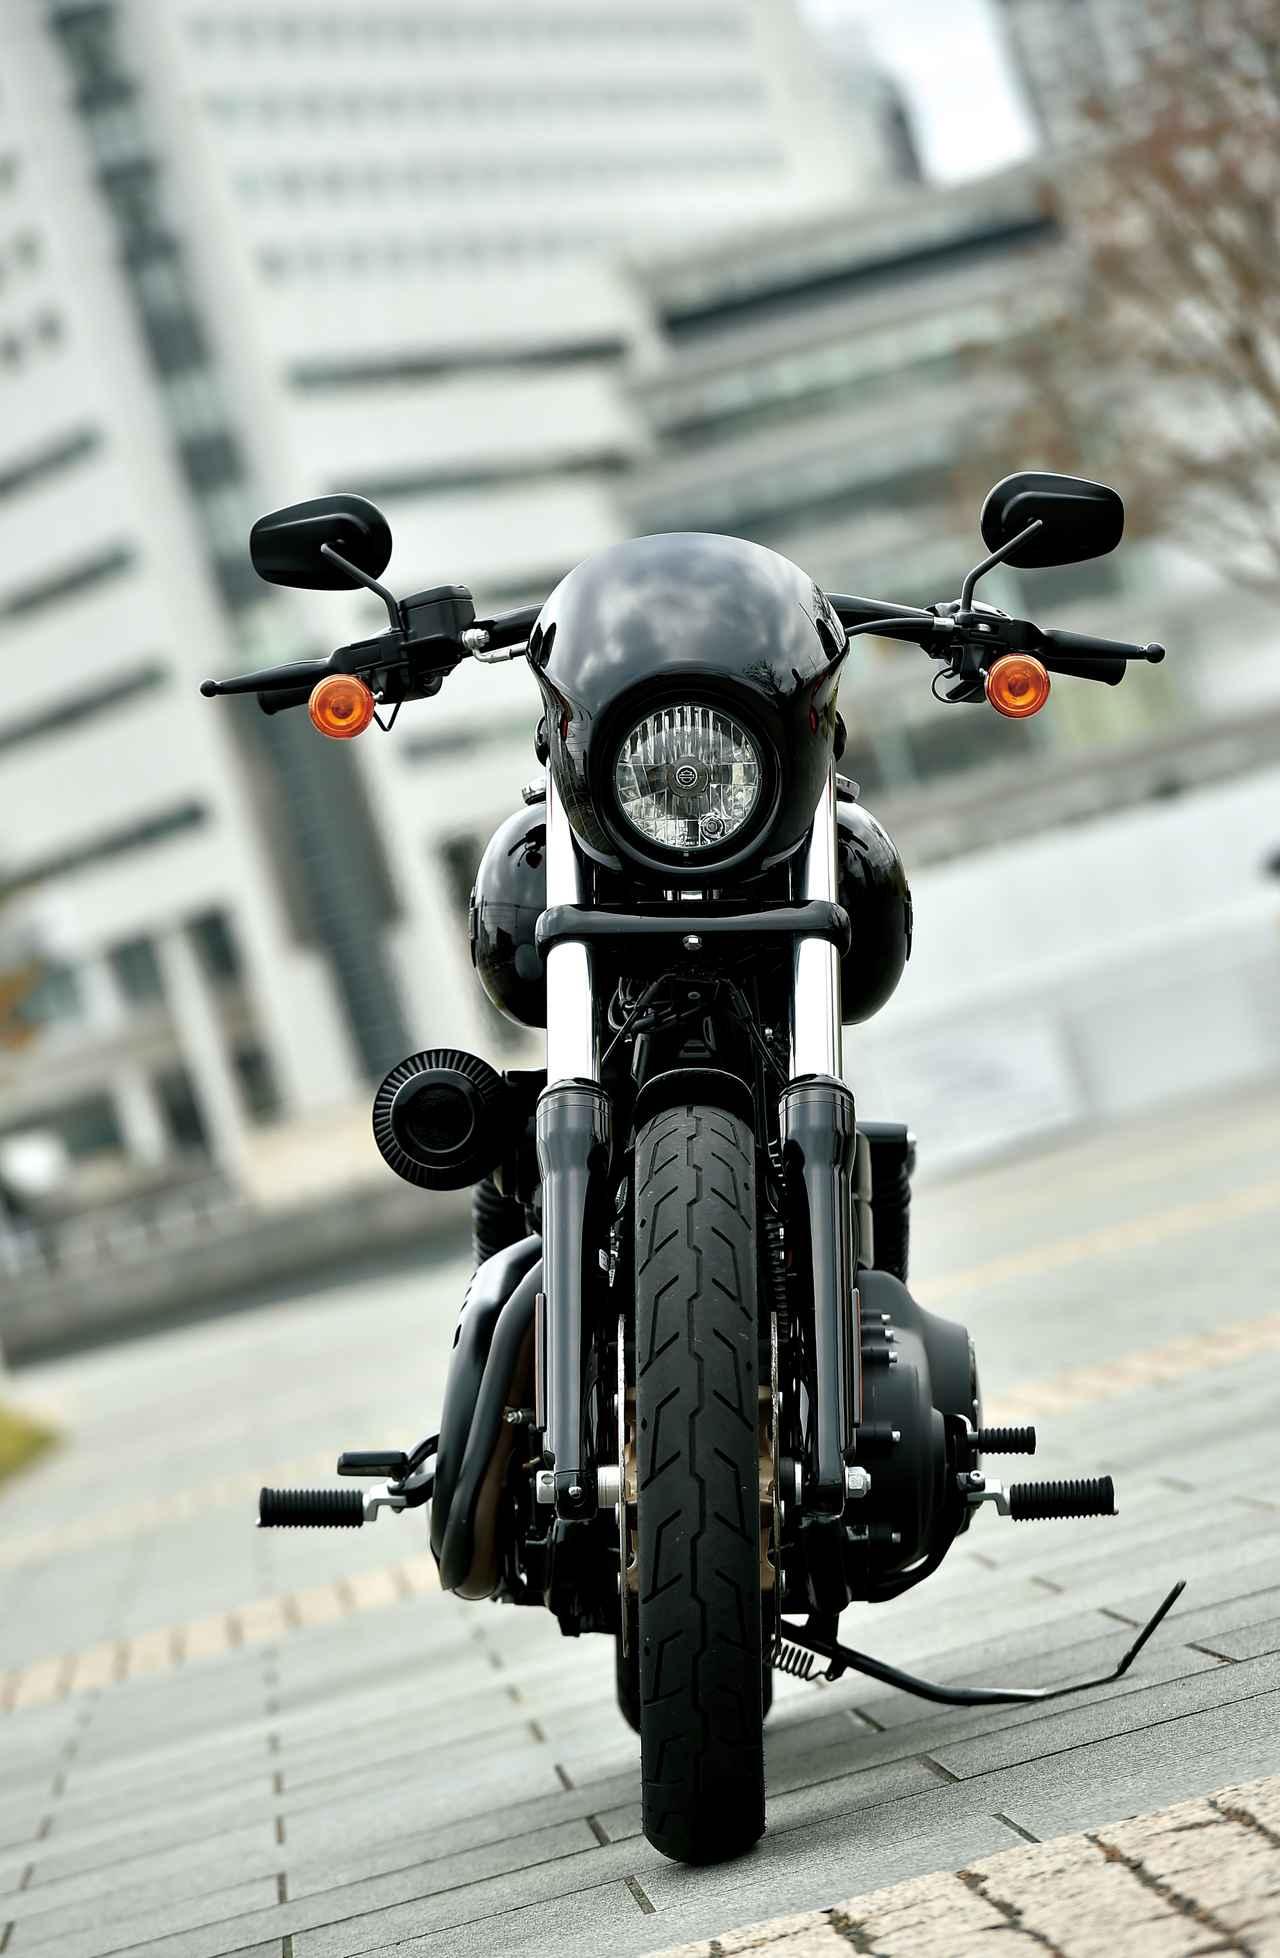 Images : 7番目の画像 - HARLEY-DAVIDSON LOW RIDER S - webオートバイ